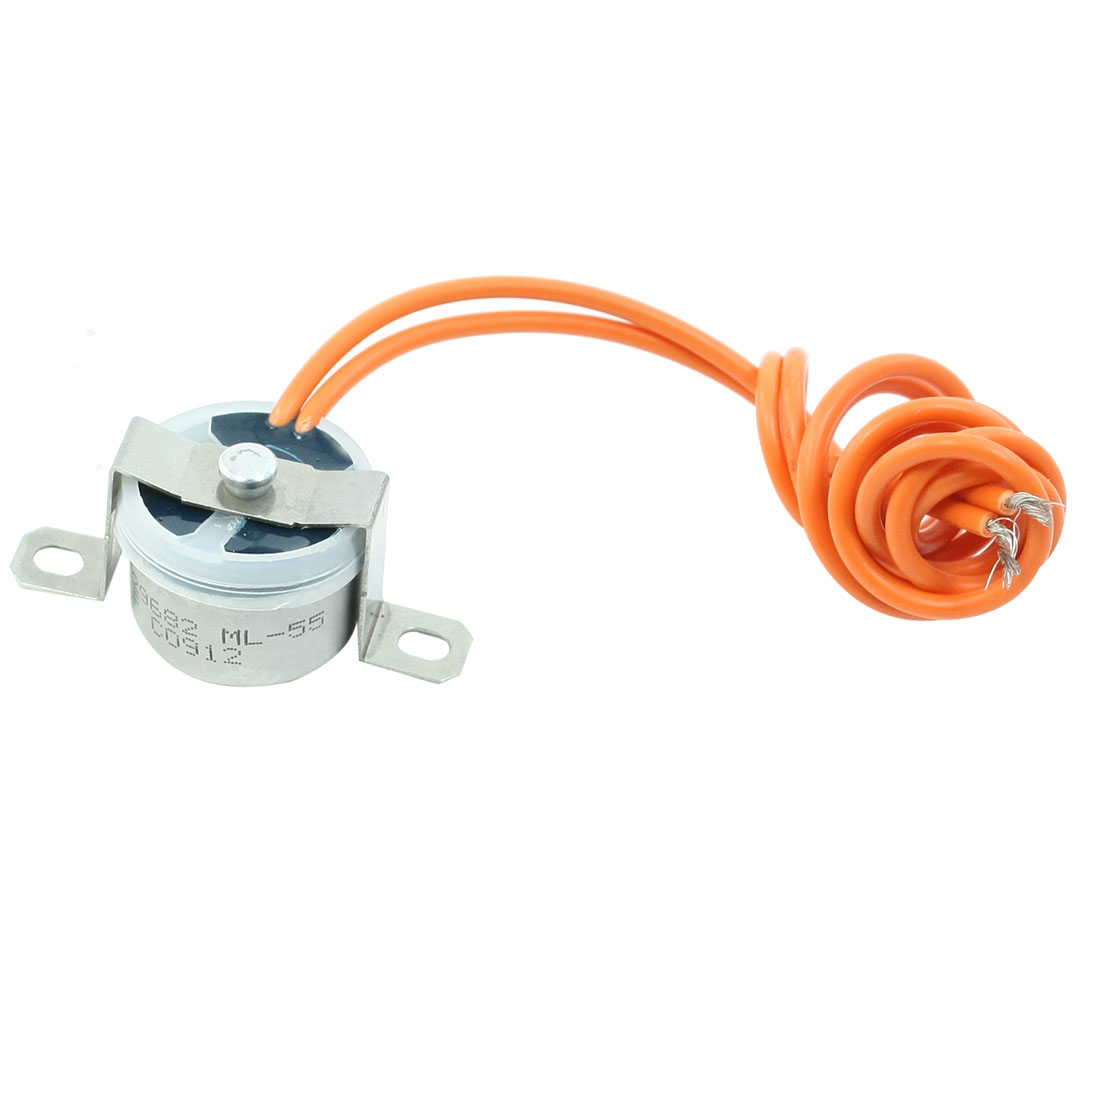 ML55 L55-35F Universal Refrigerator Defrost Heat Retaining Device